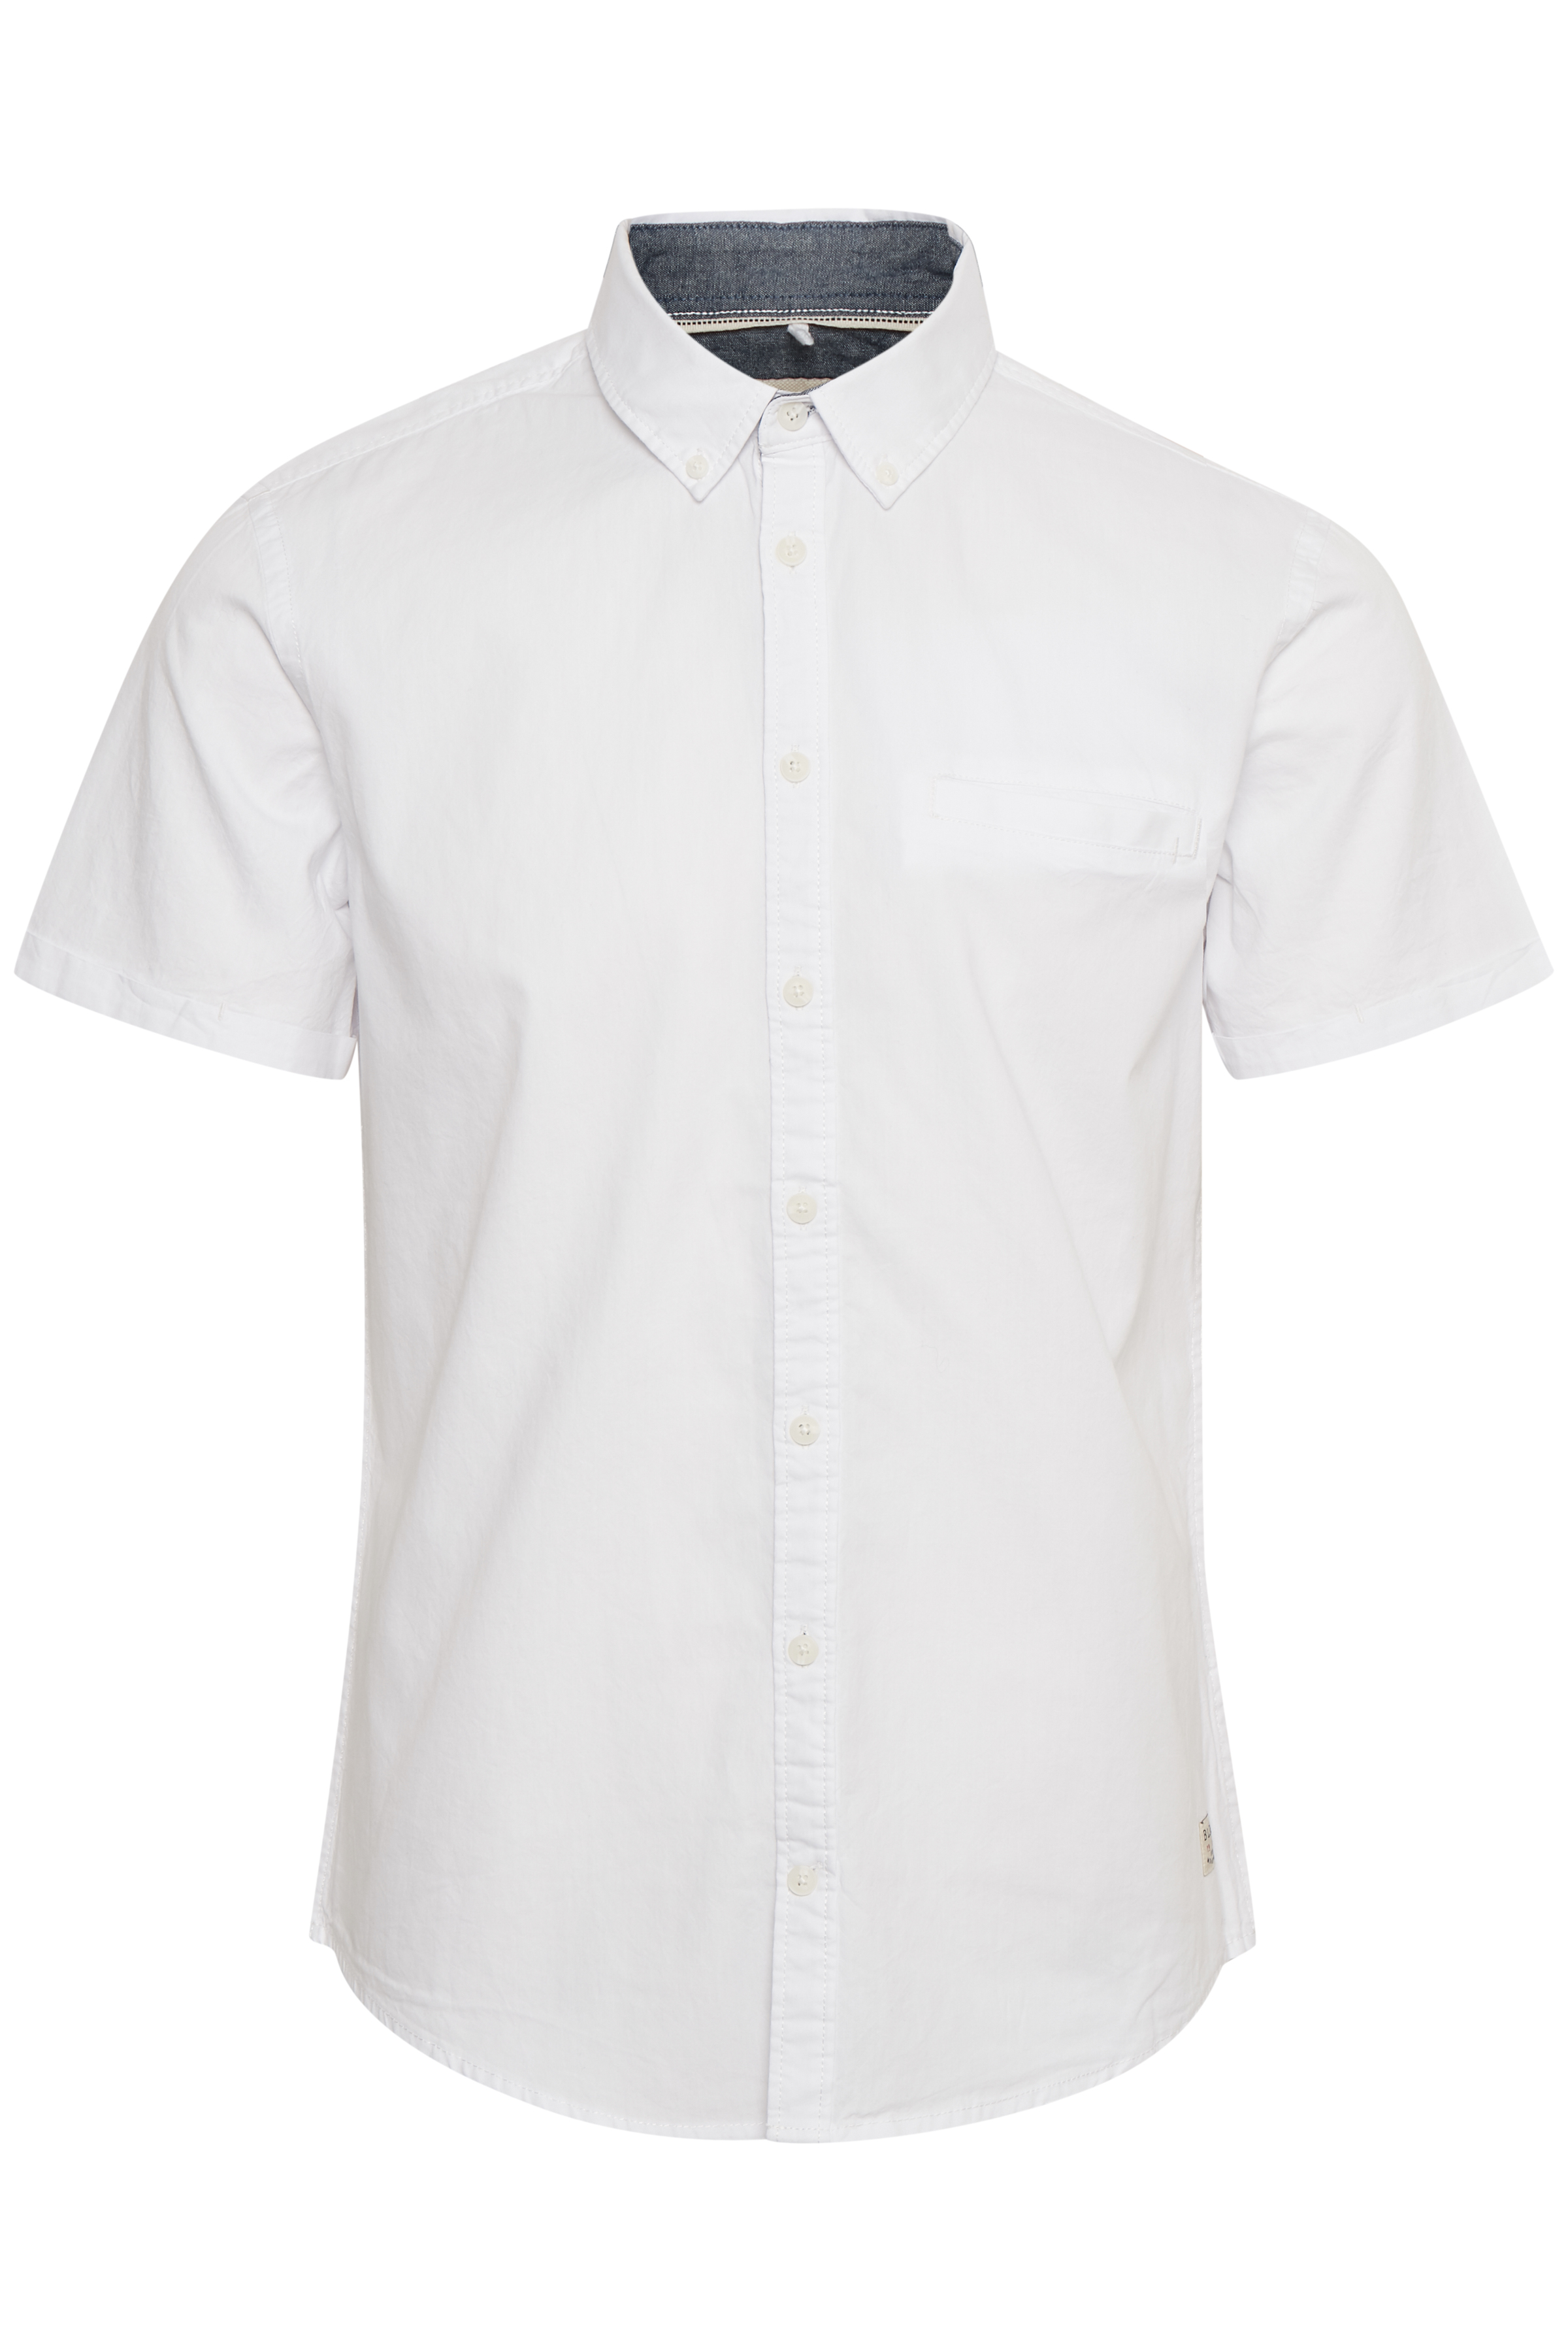 Image of   Blend He Herre Kortærmet skjorte - Hvid